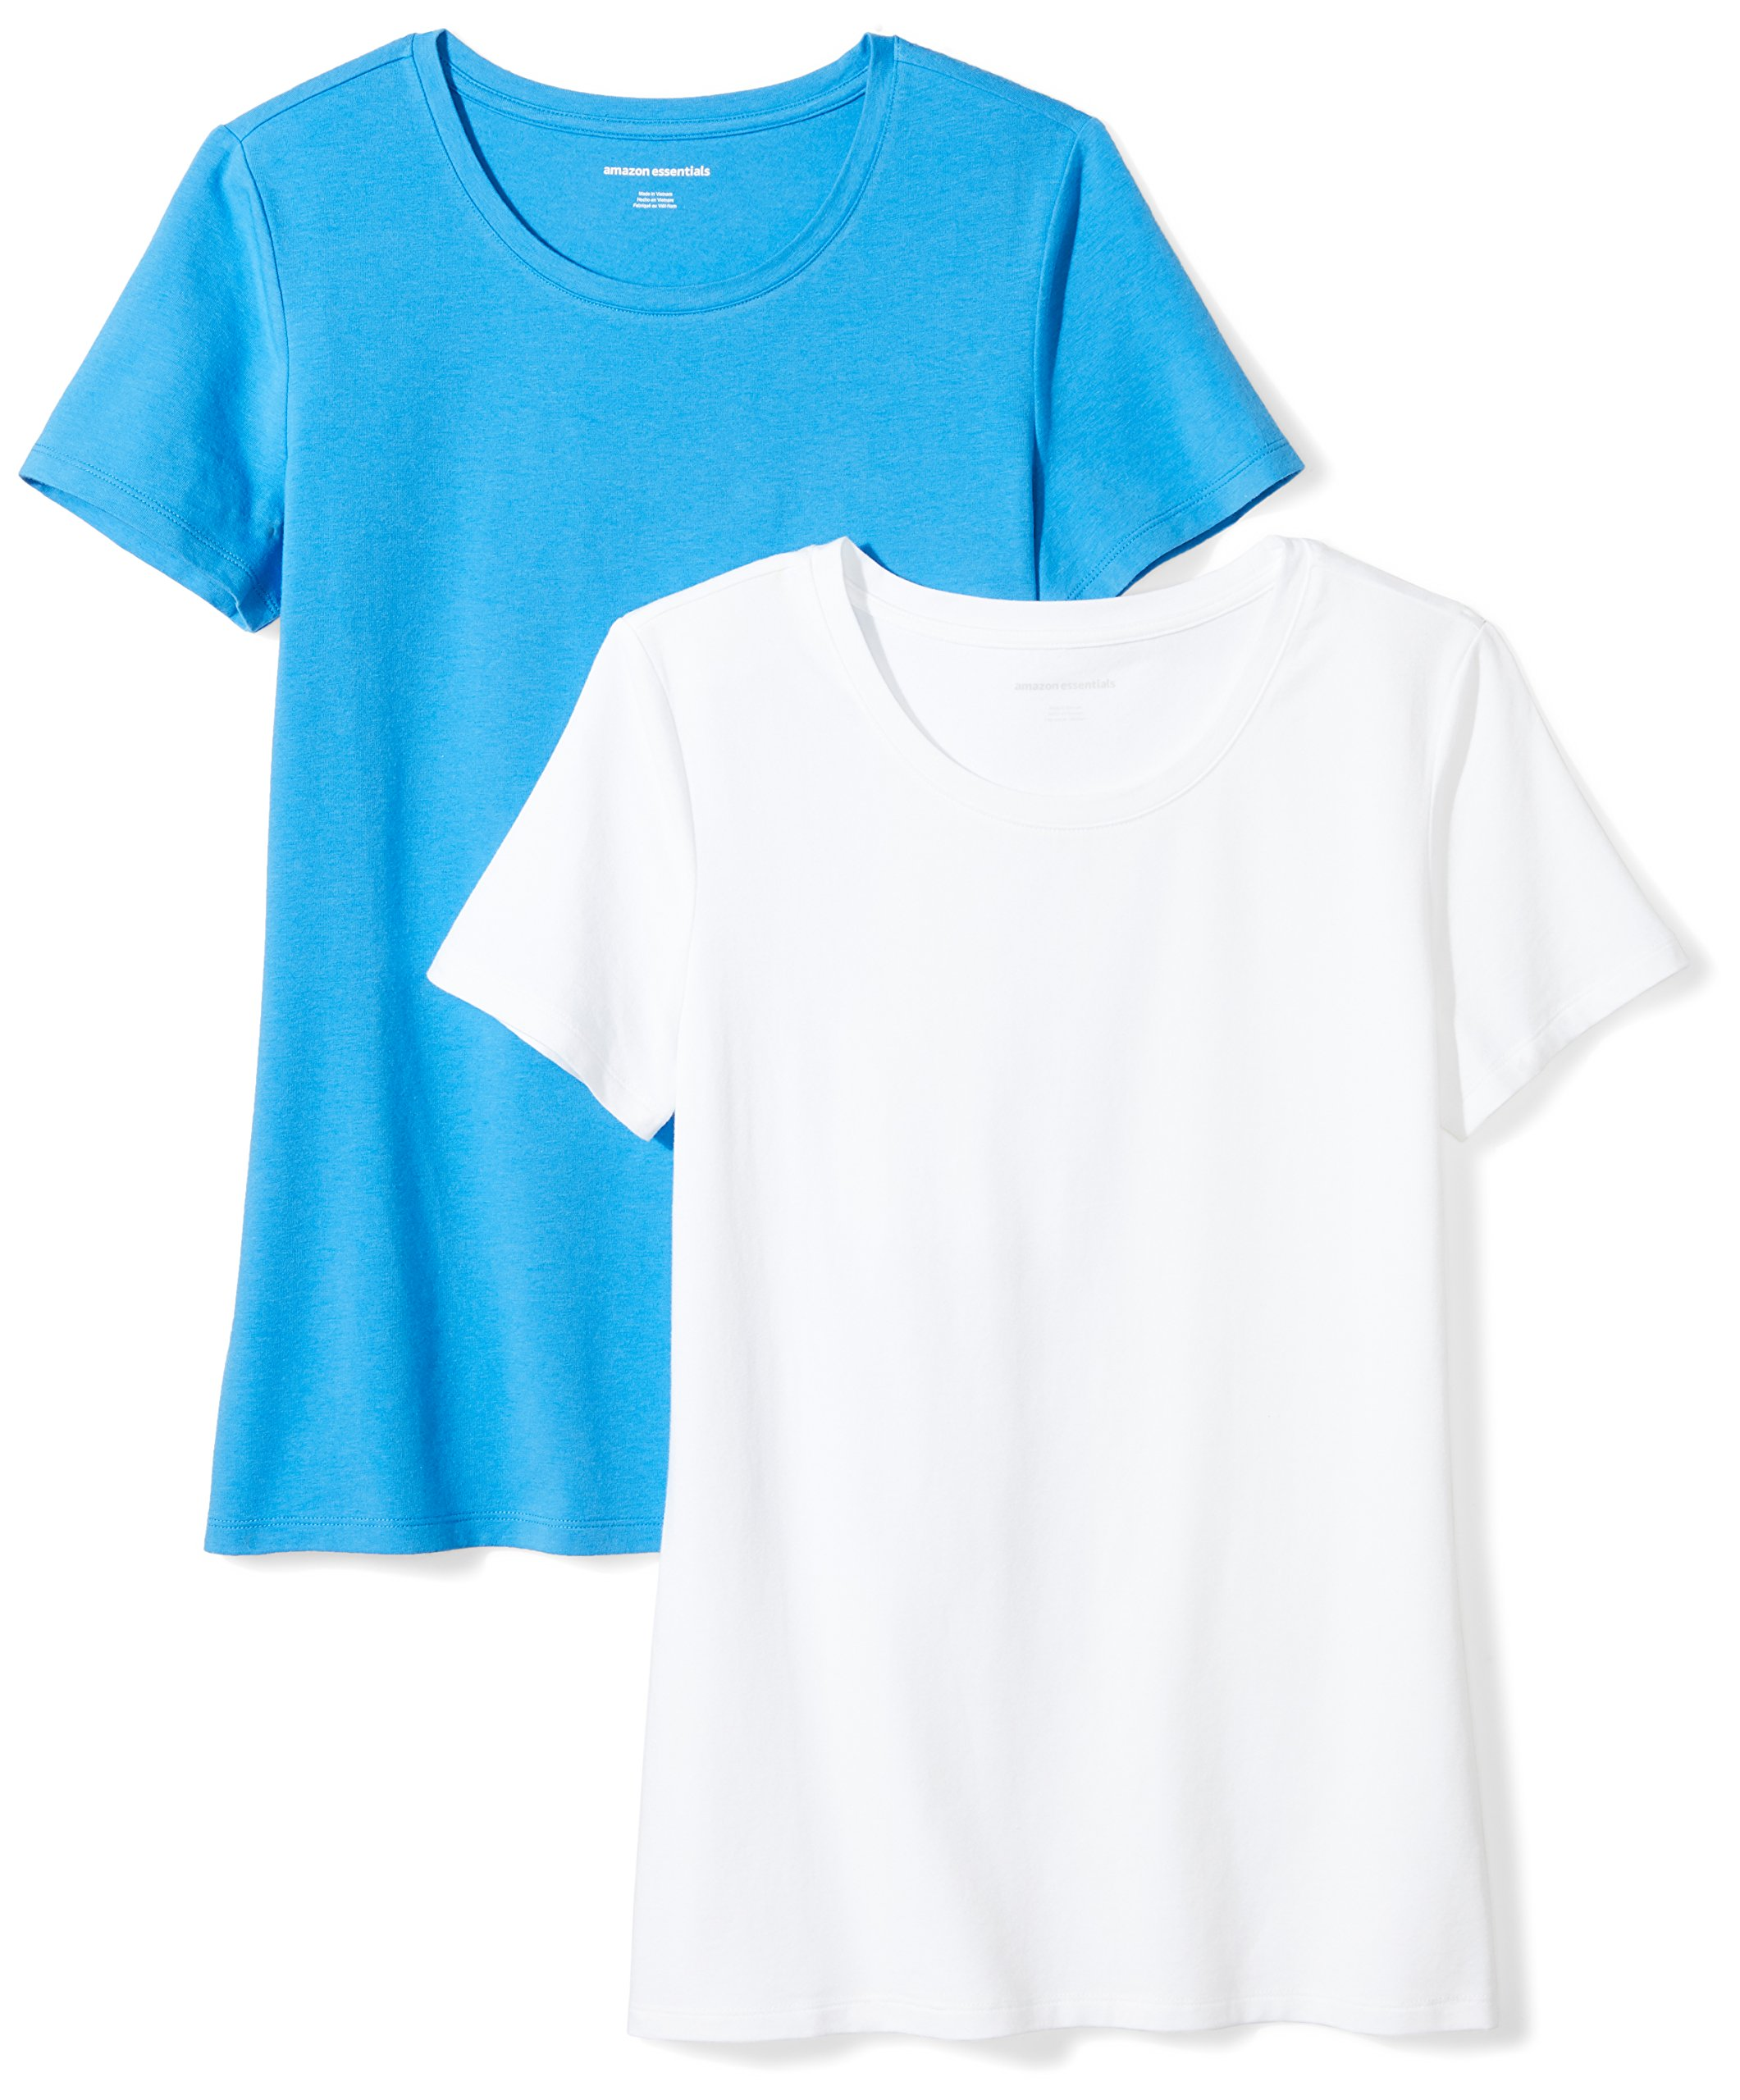 Amazon Essentials Women's 2-Pack Short-Sleeve Crewneck Solid T-Shirt, Bright Blue/White, Medium